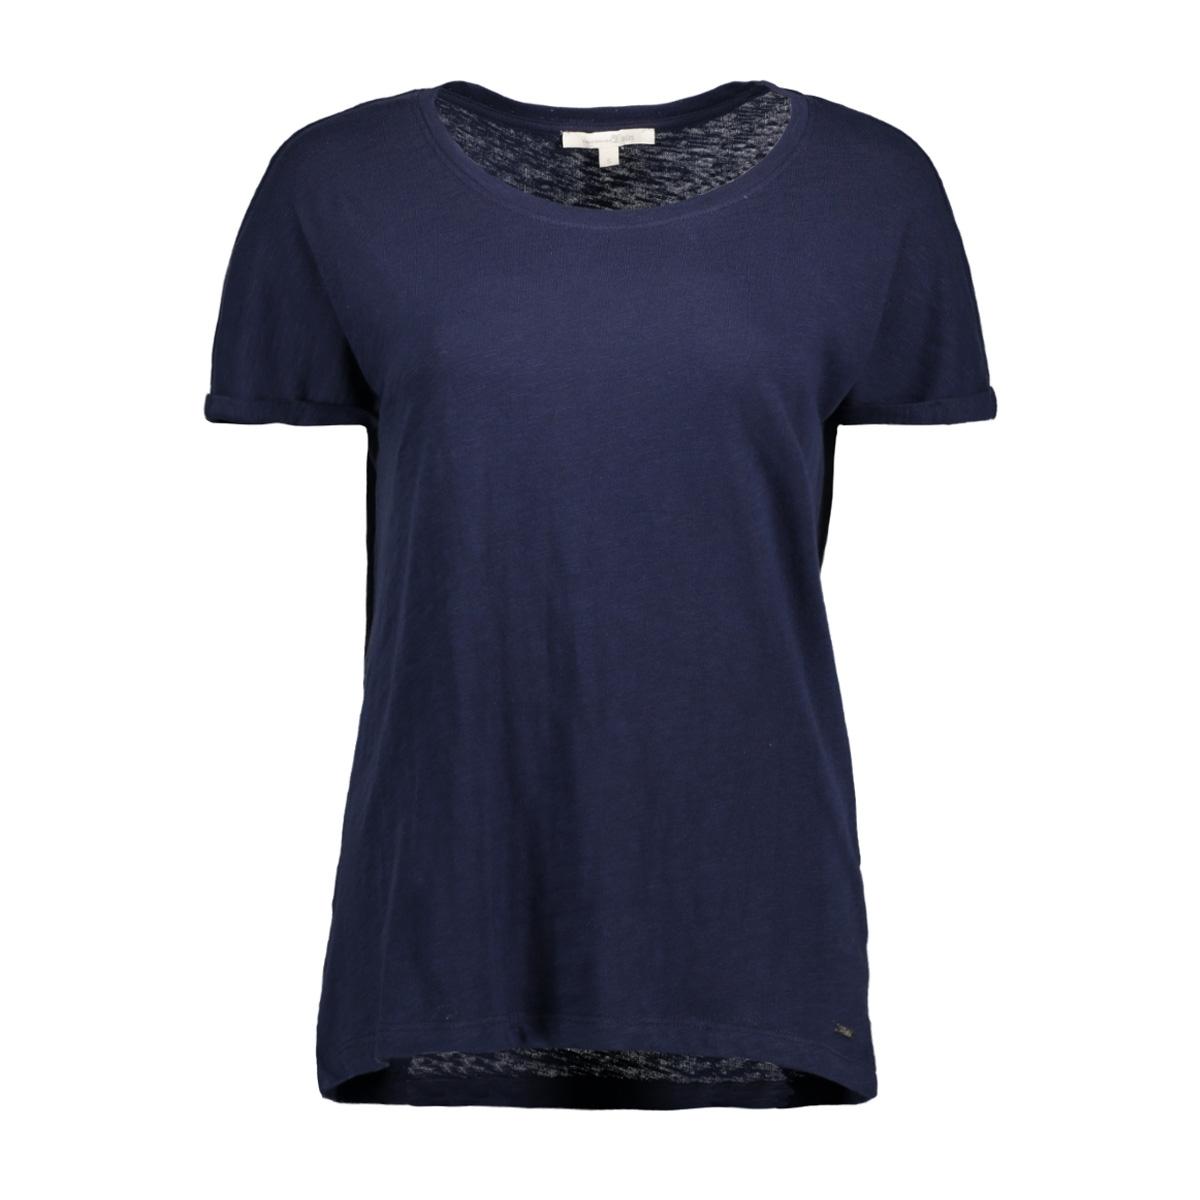 1055340.09.71 tom tailor t-shirt 6593